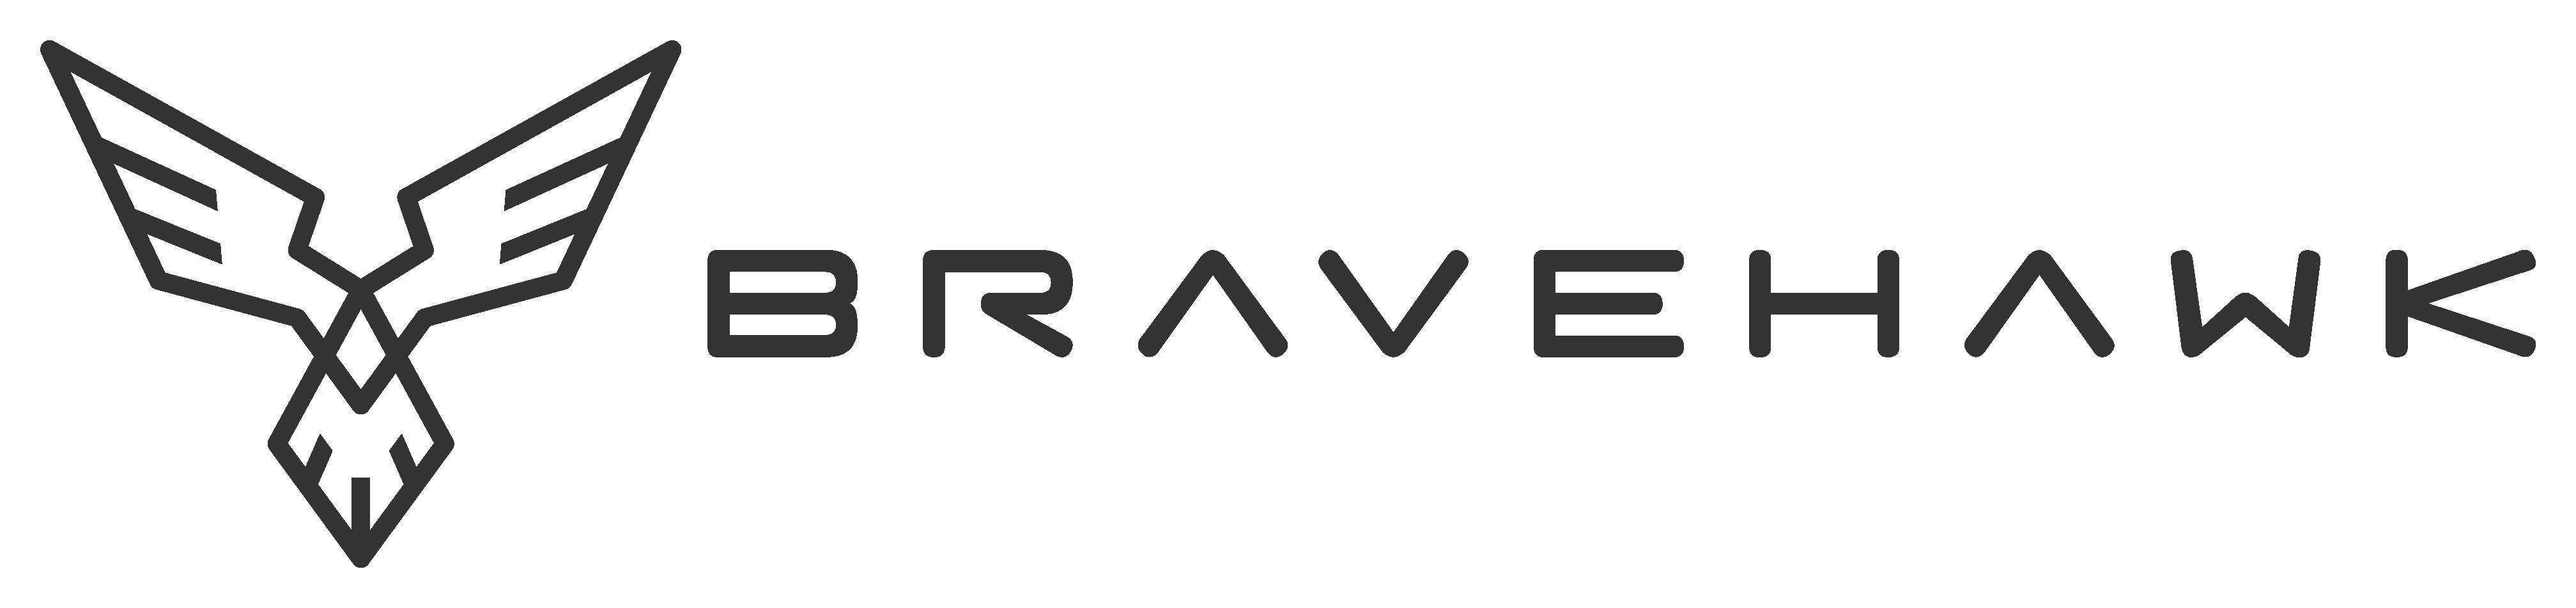 ***Design the new BRAVEHAWK logo***